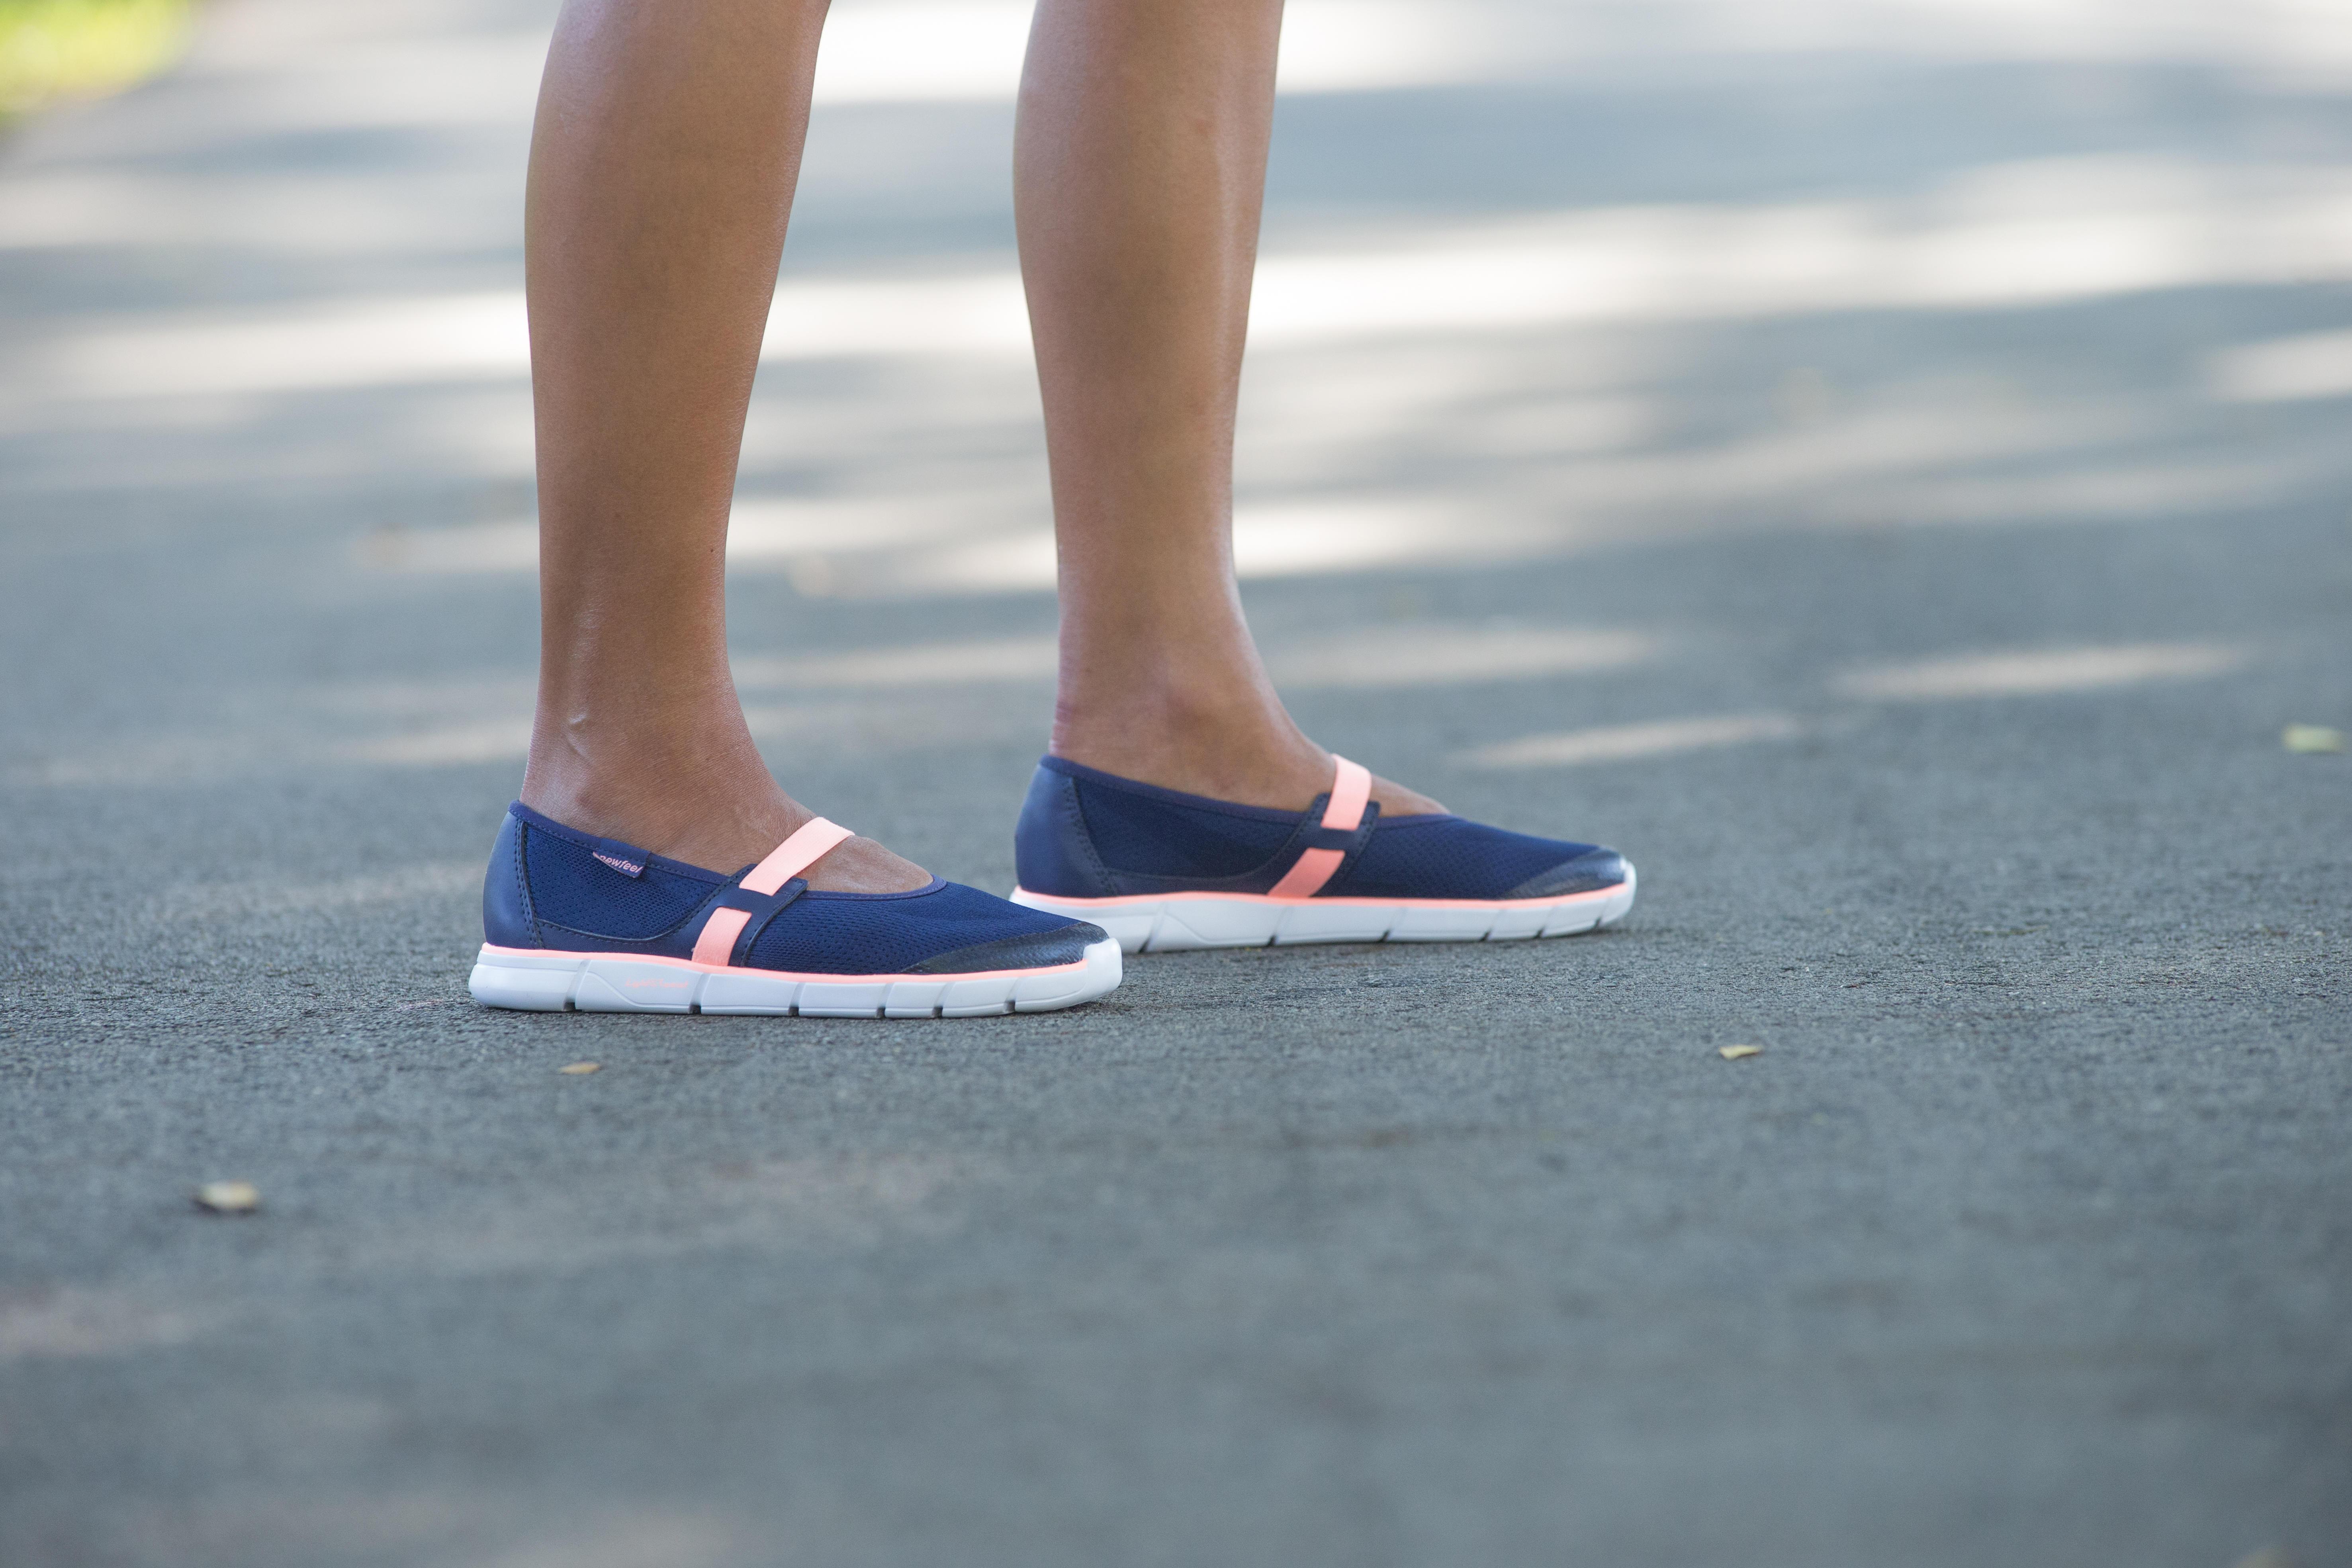 Soft 520 Women's Fitness Walking Ballerina Pumps - Navy/Coral